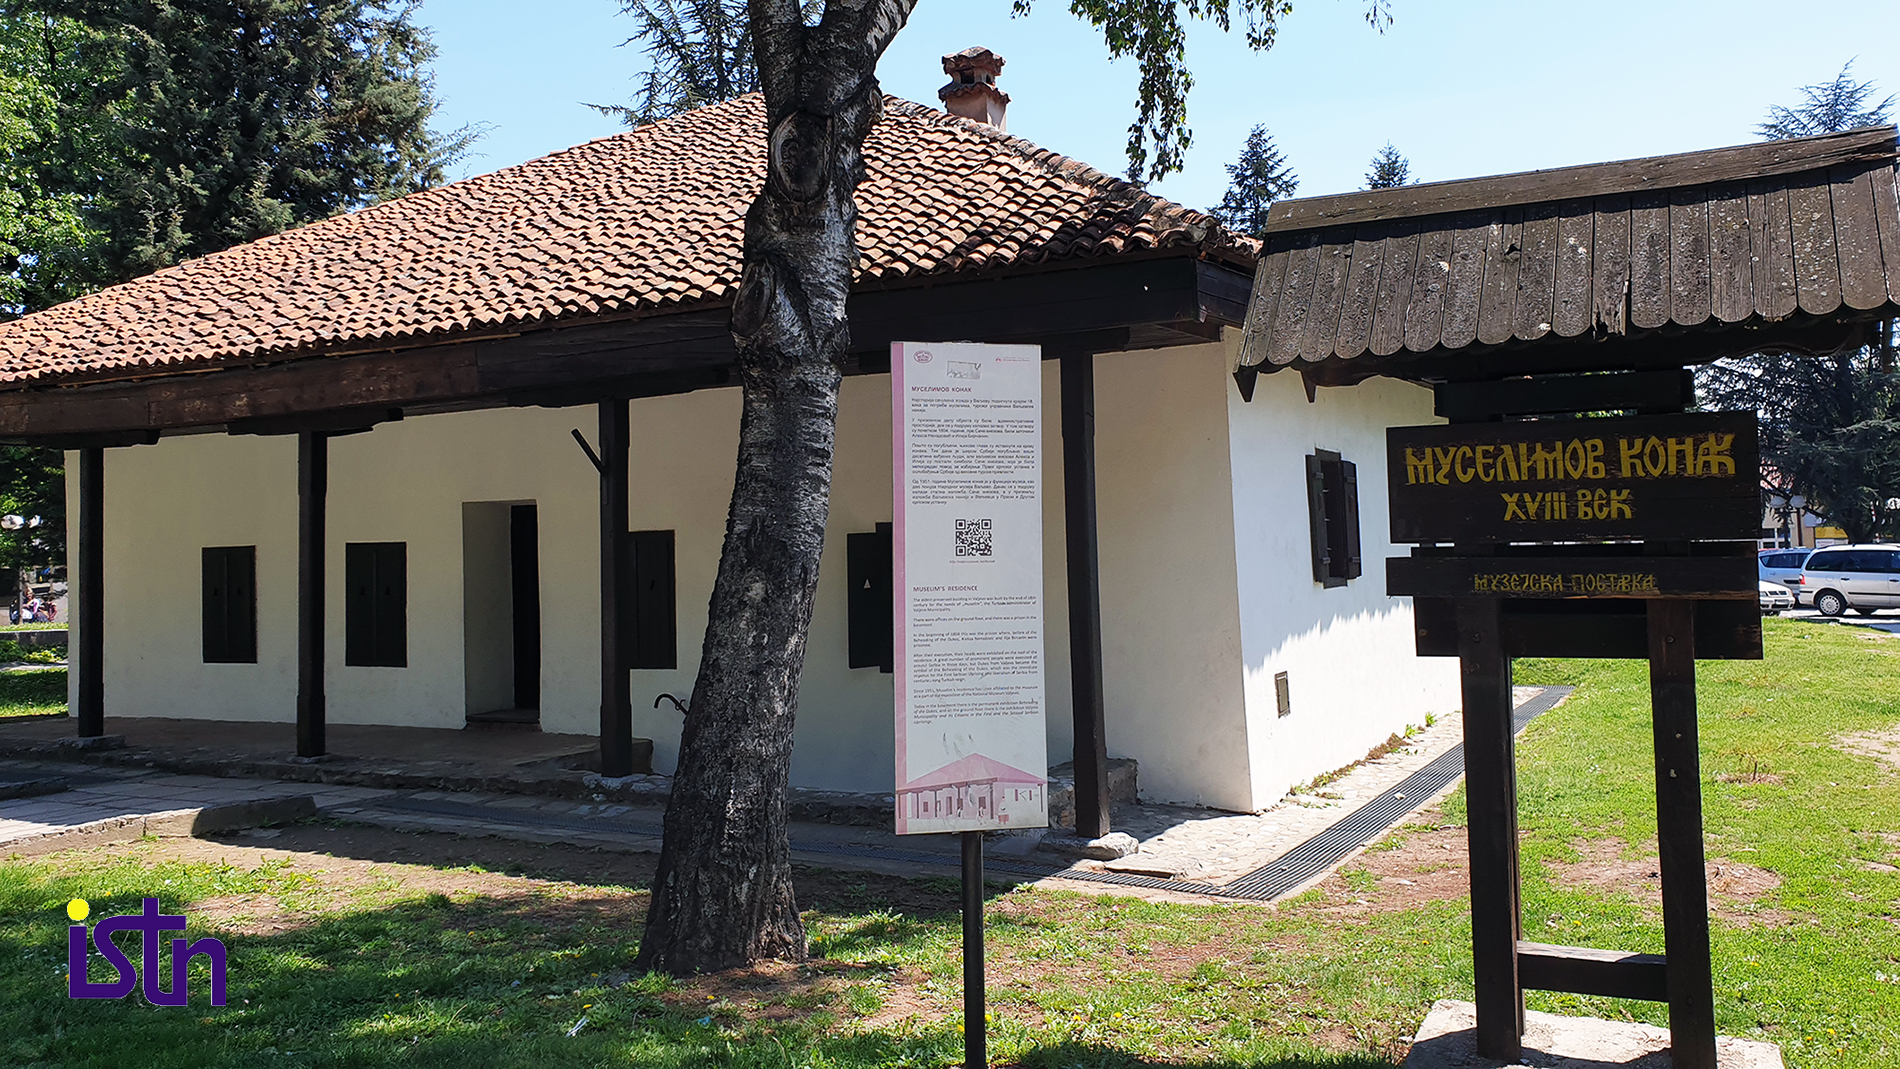 Valjevo, Muselinov konak, ISTN